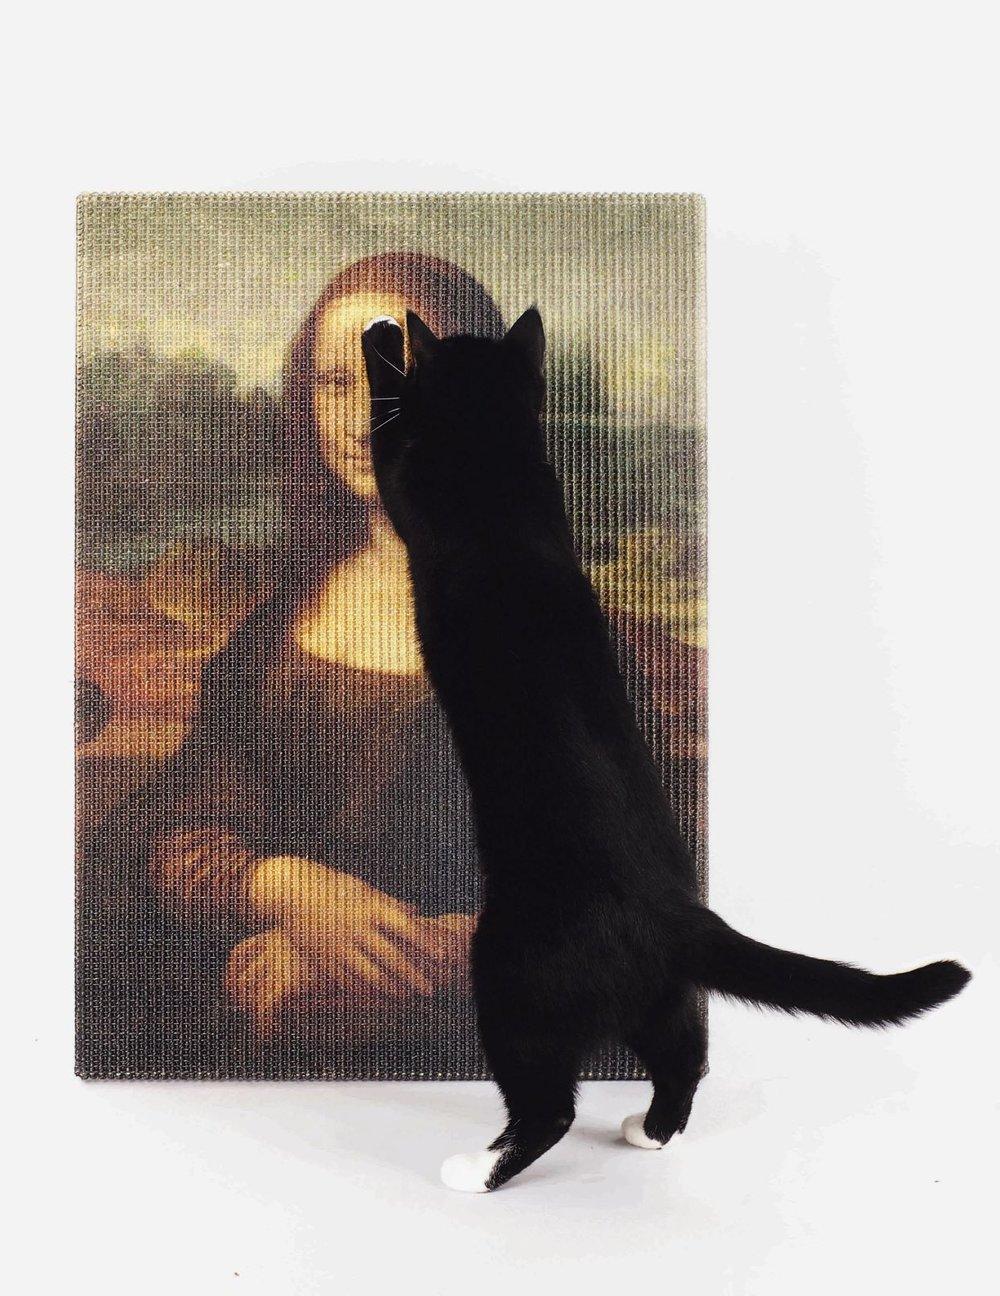 Copycat Art Scratcher by    Erik Stehmann